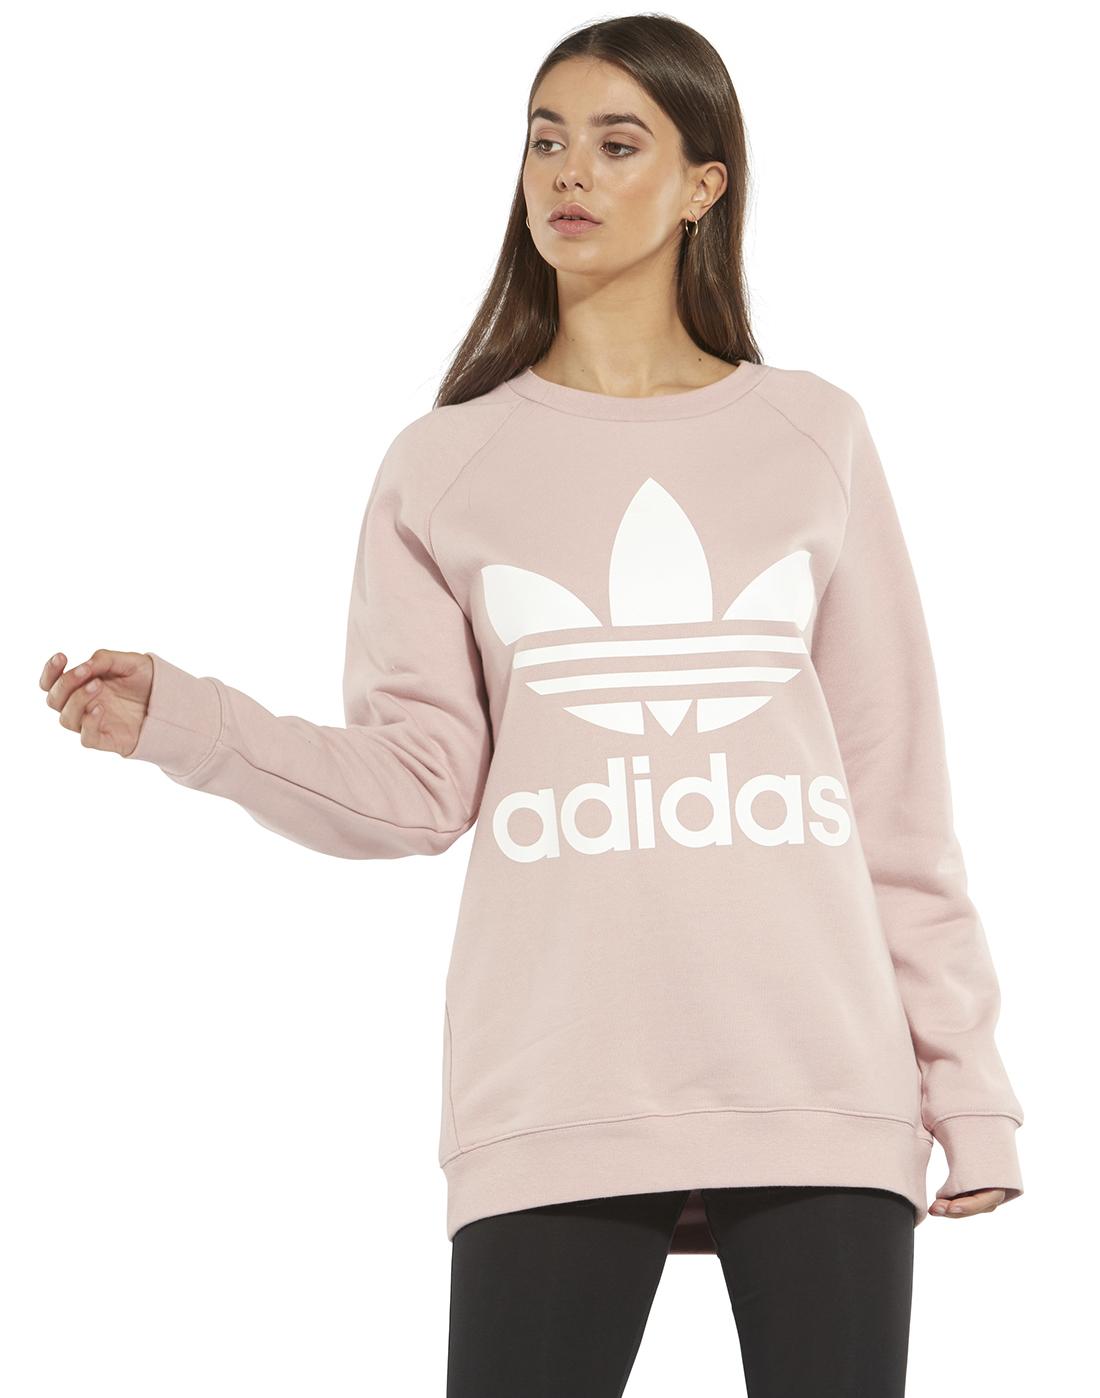 Originals Pink Oversized Style Women's Sports Adidas TopLife 8OZPkNn0wX